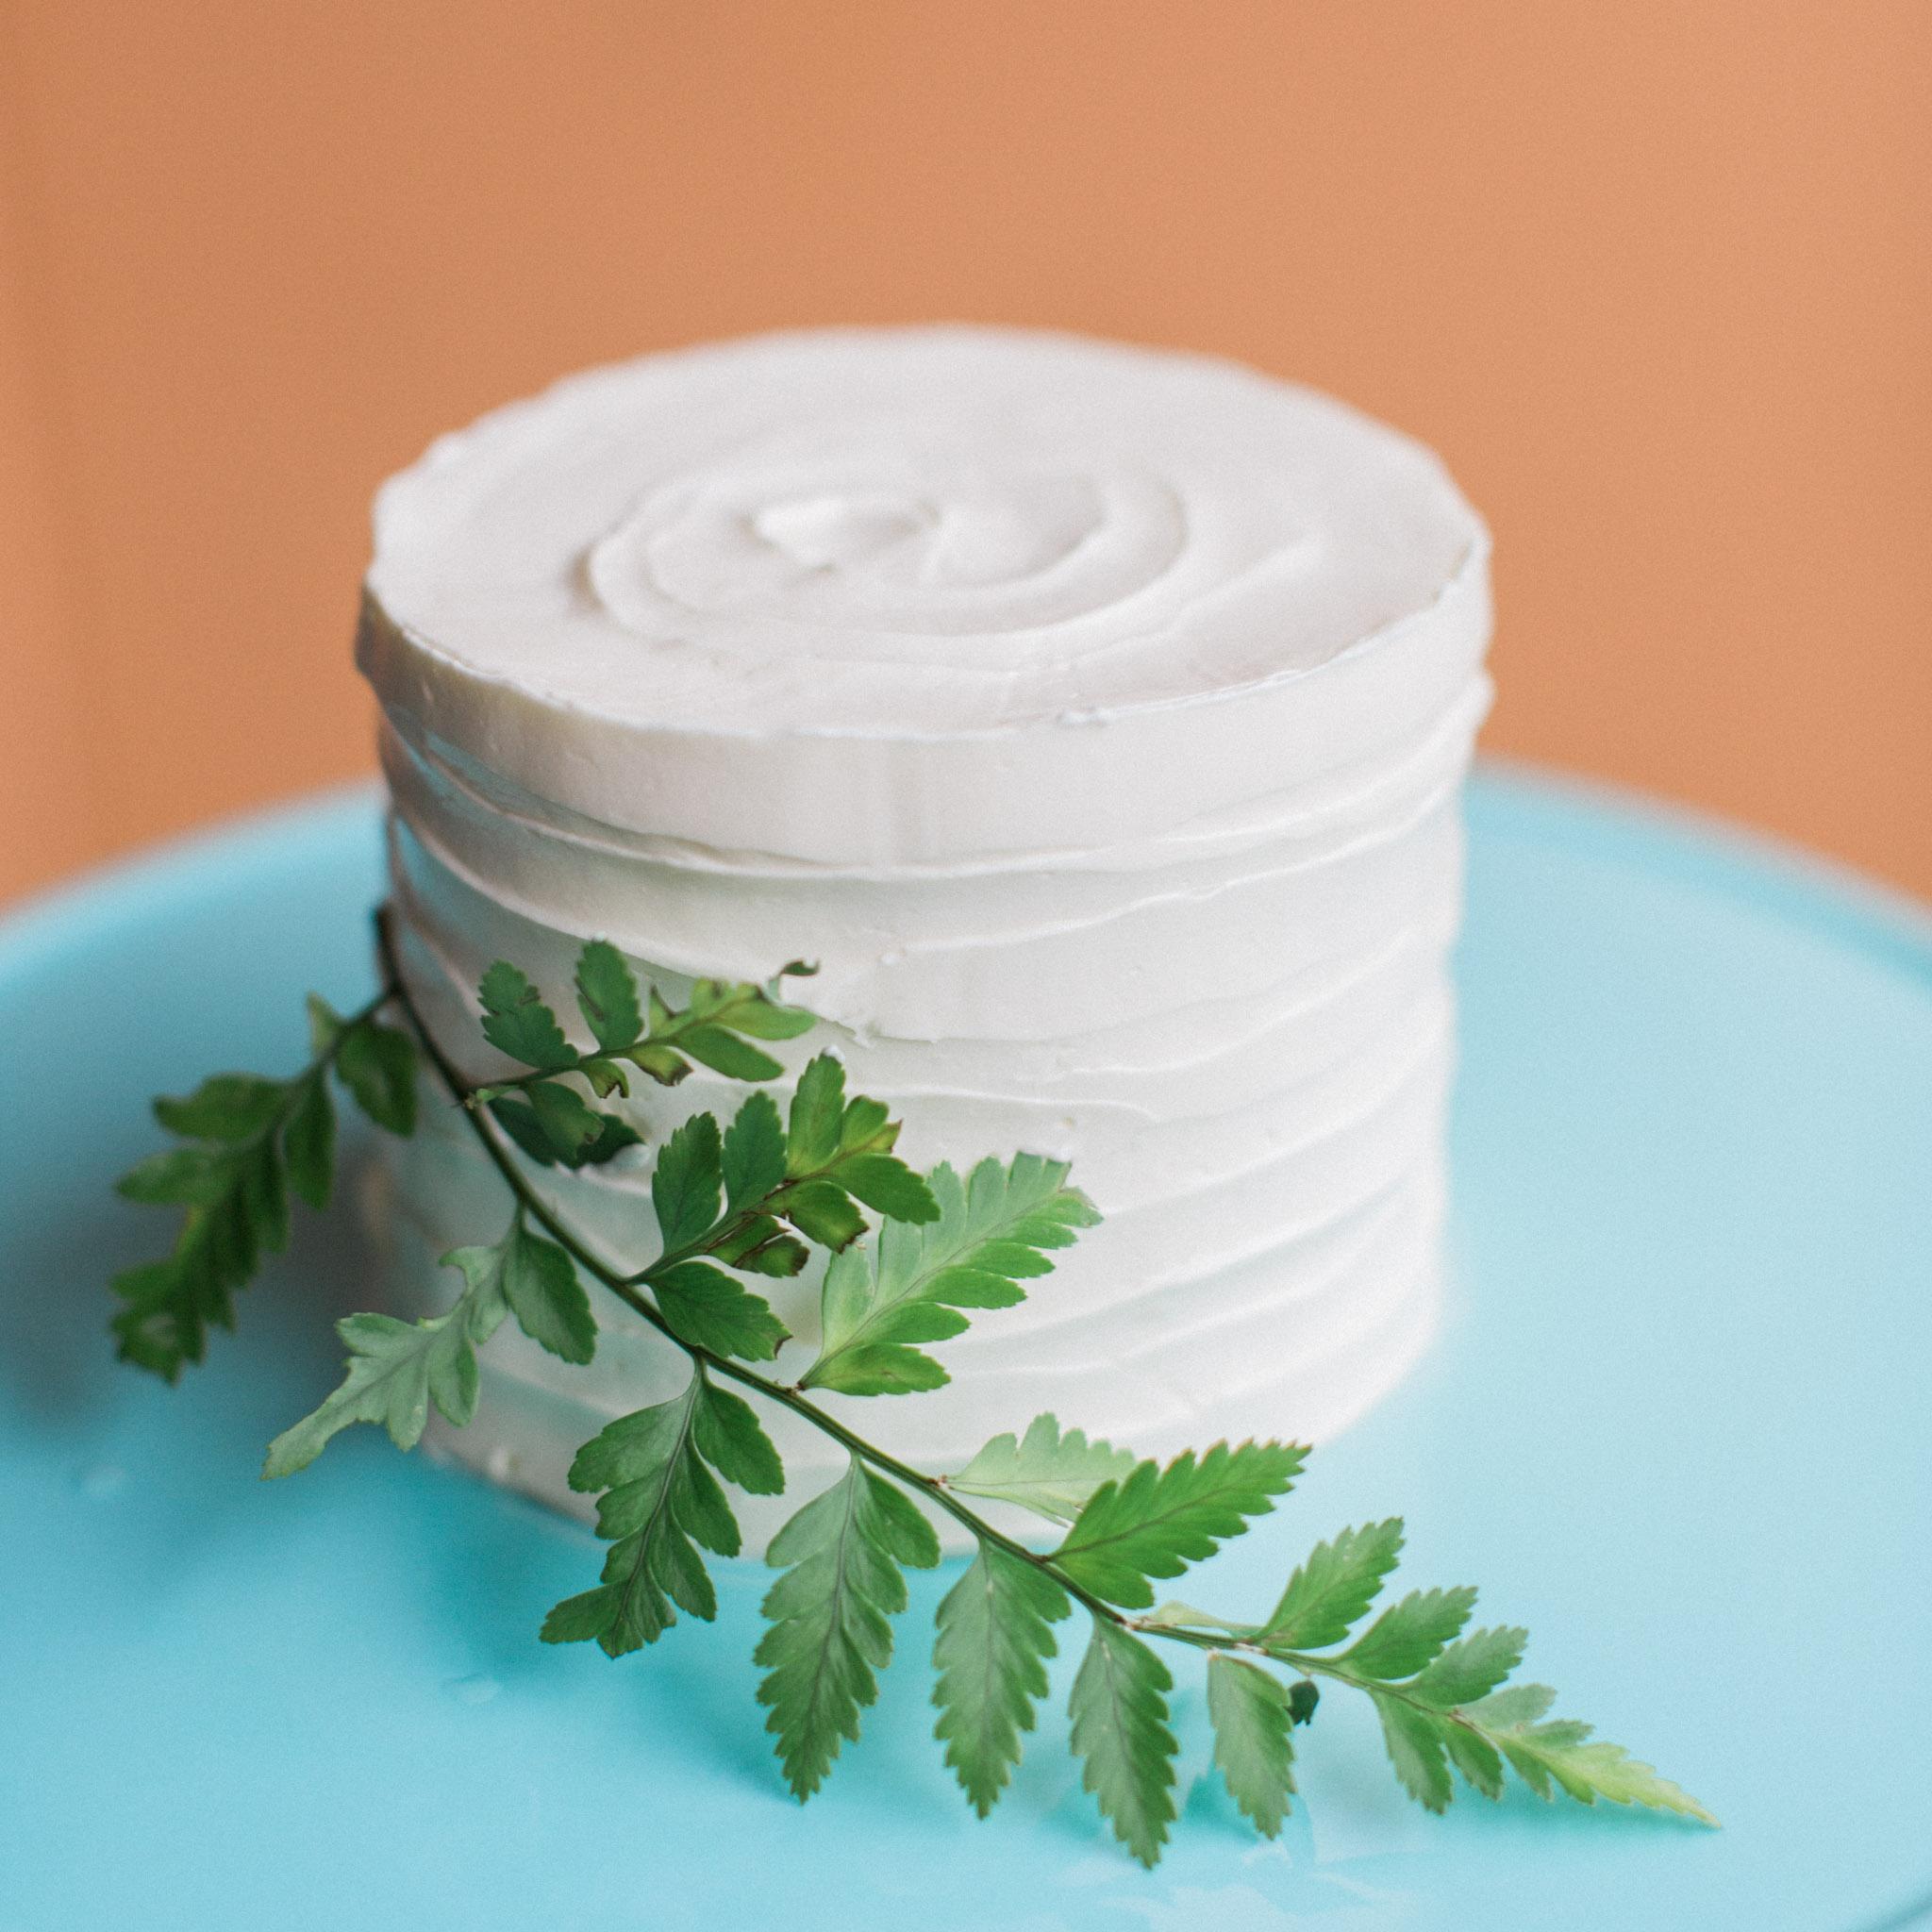 Wedding-Cake-Tasting-4-inch-cake-Marie-Shannon-Confections-Rhianna-Mercier-Photography -1.jpg